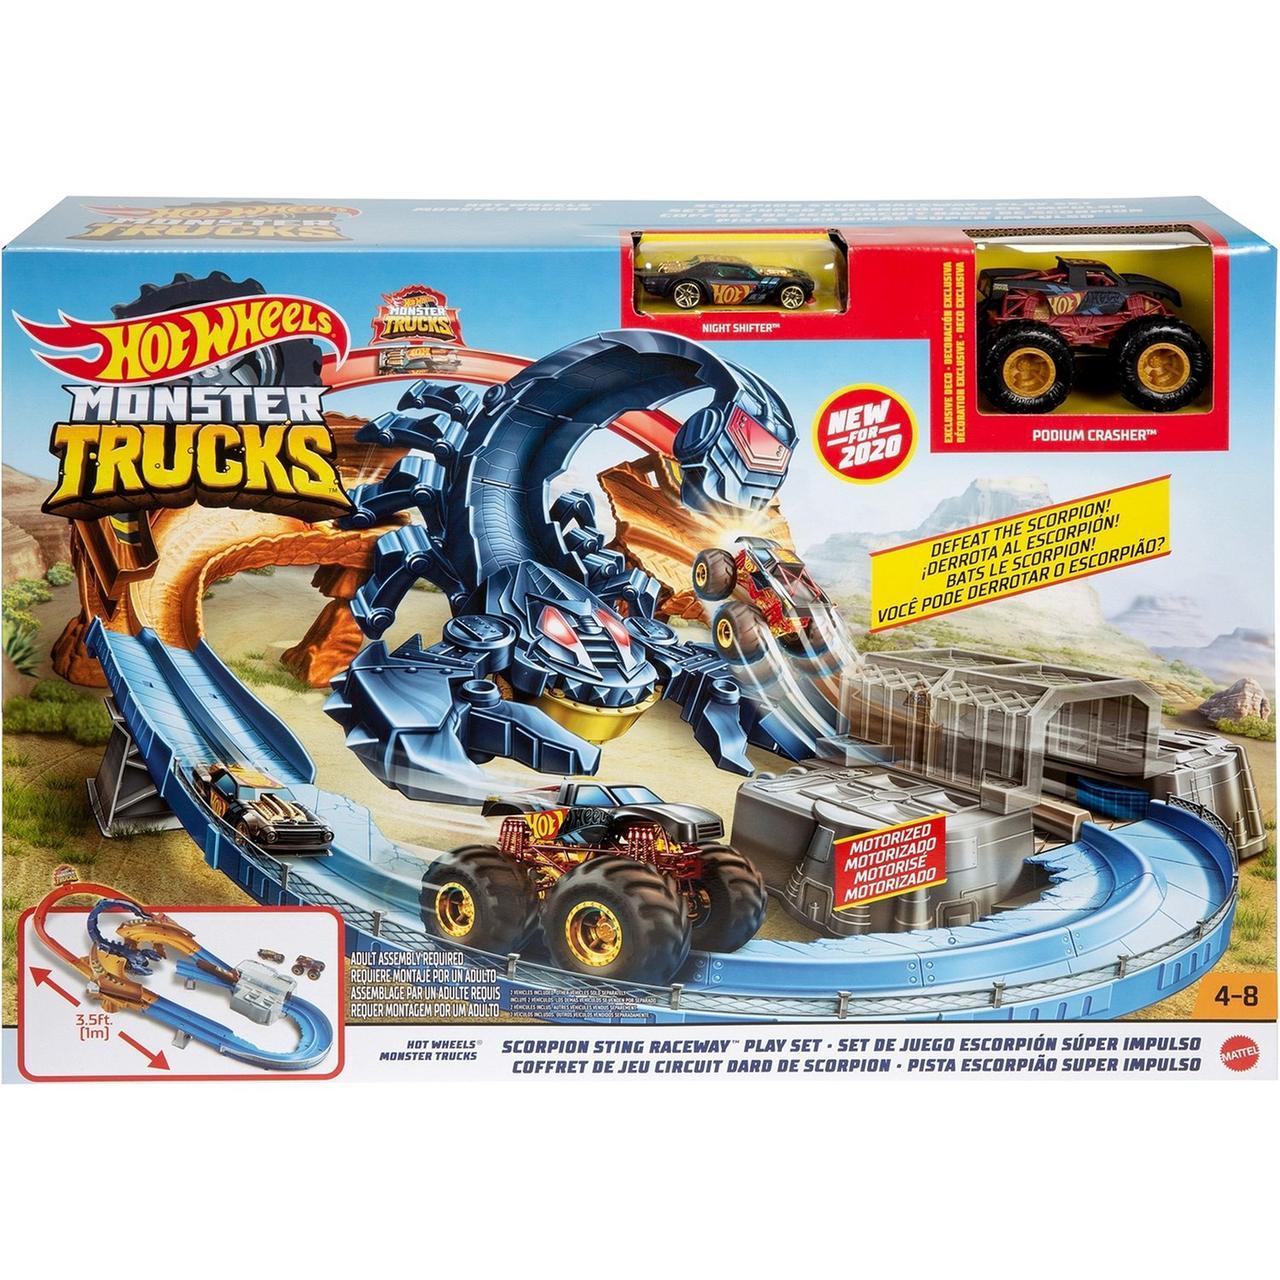 Hot Wheels Игровой набор Monster Trucks: Гонка со скорпионом GNB0, Хот Вилс Монстр-тракc